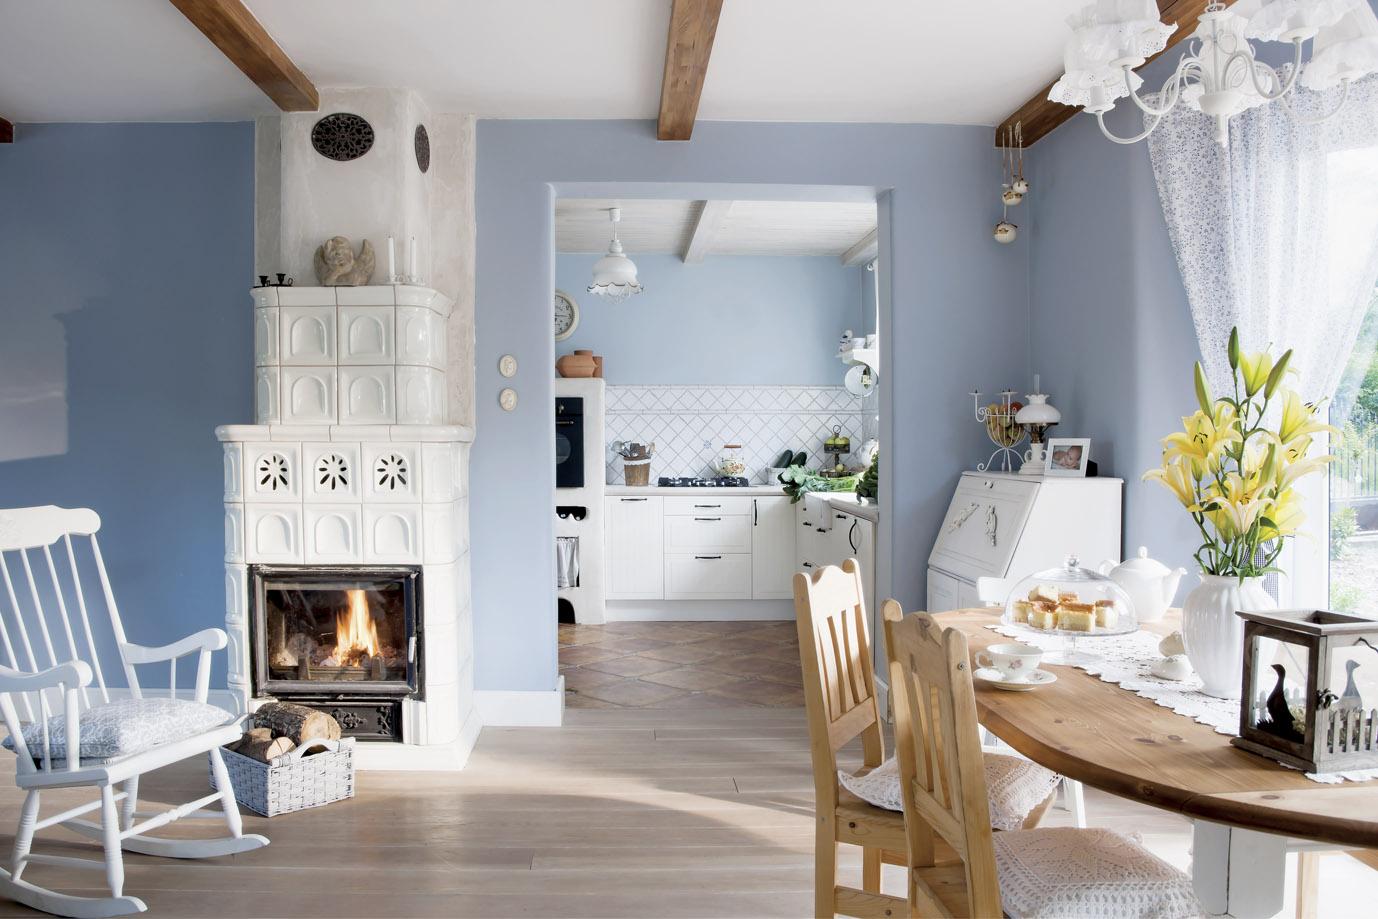 Amenajarea unei case de la ar jurnal de design interior for New country style homes